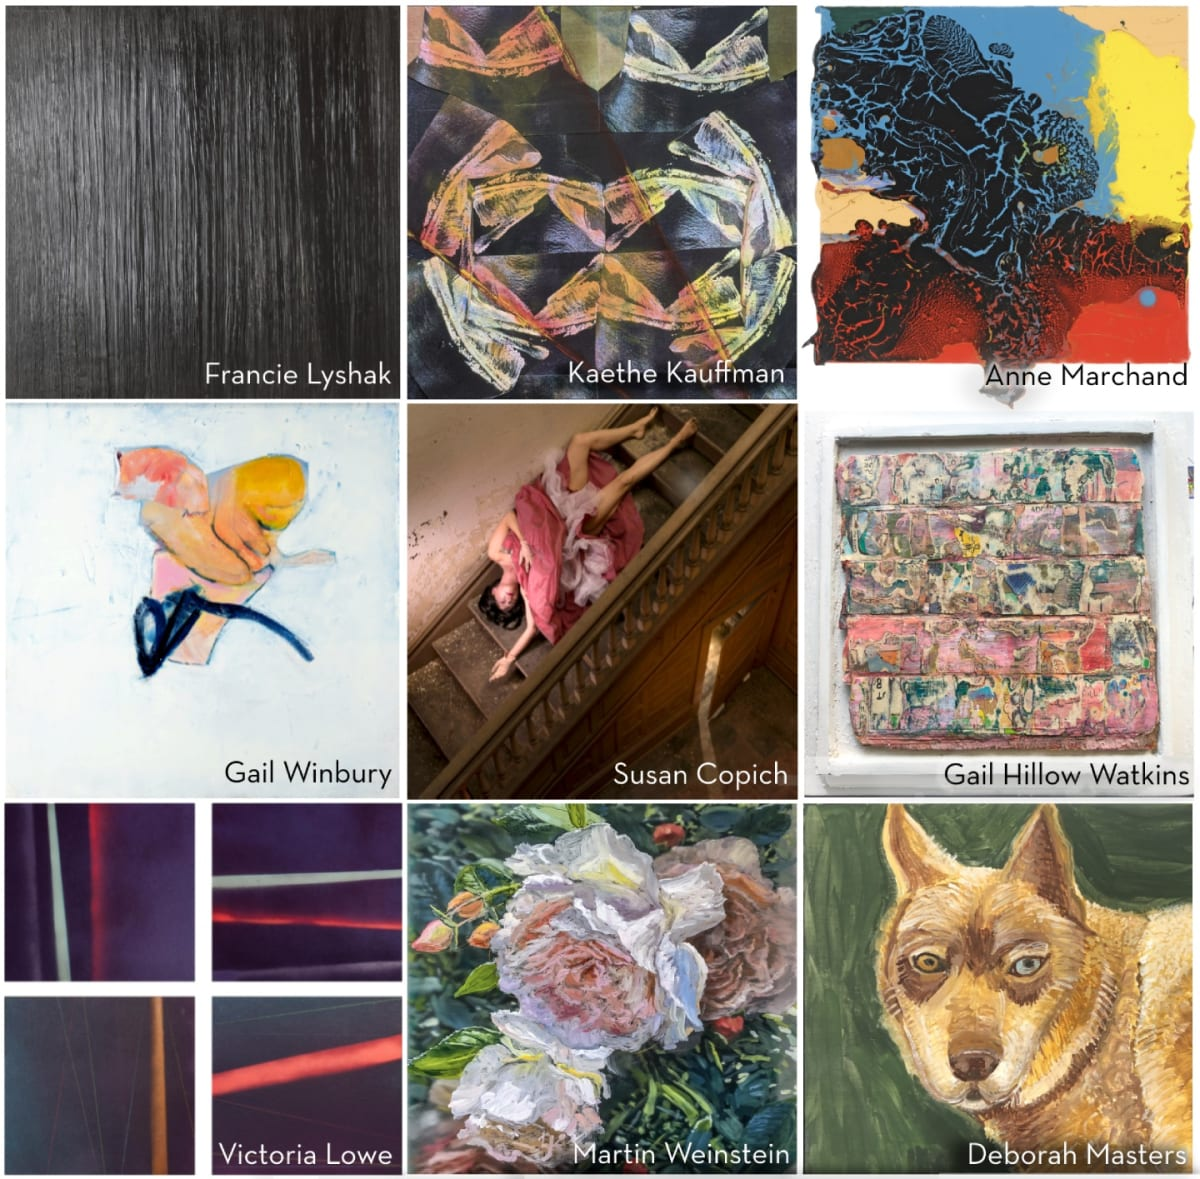 Affordable Art Fair in New York City